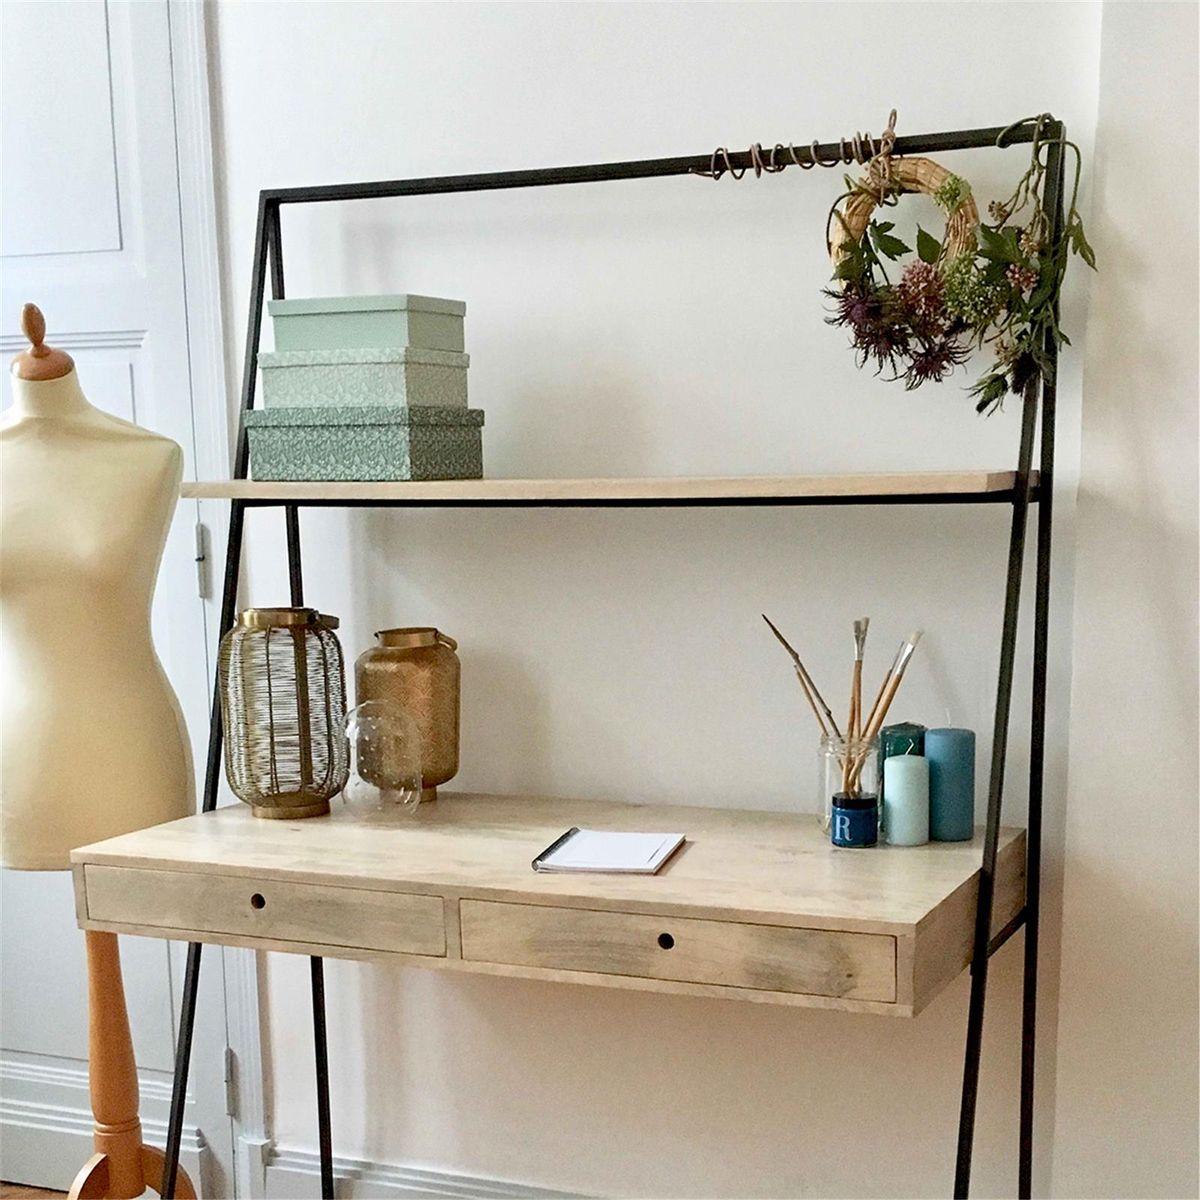 bureau mural dandy avec tag re en manguier pi tement. Black Bedroom Furniture Sets. Home Design Ideas